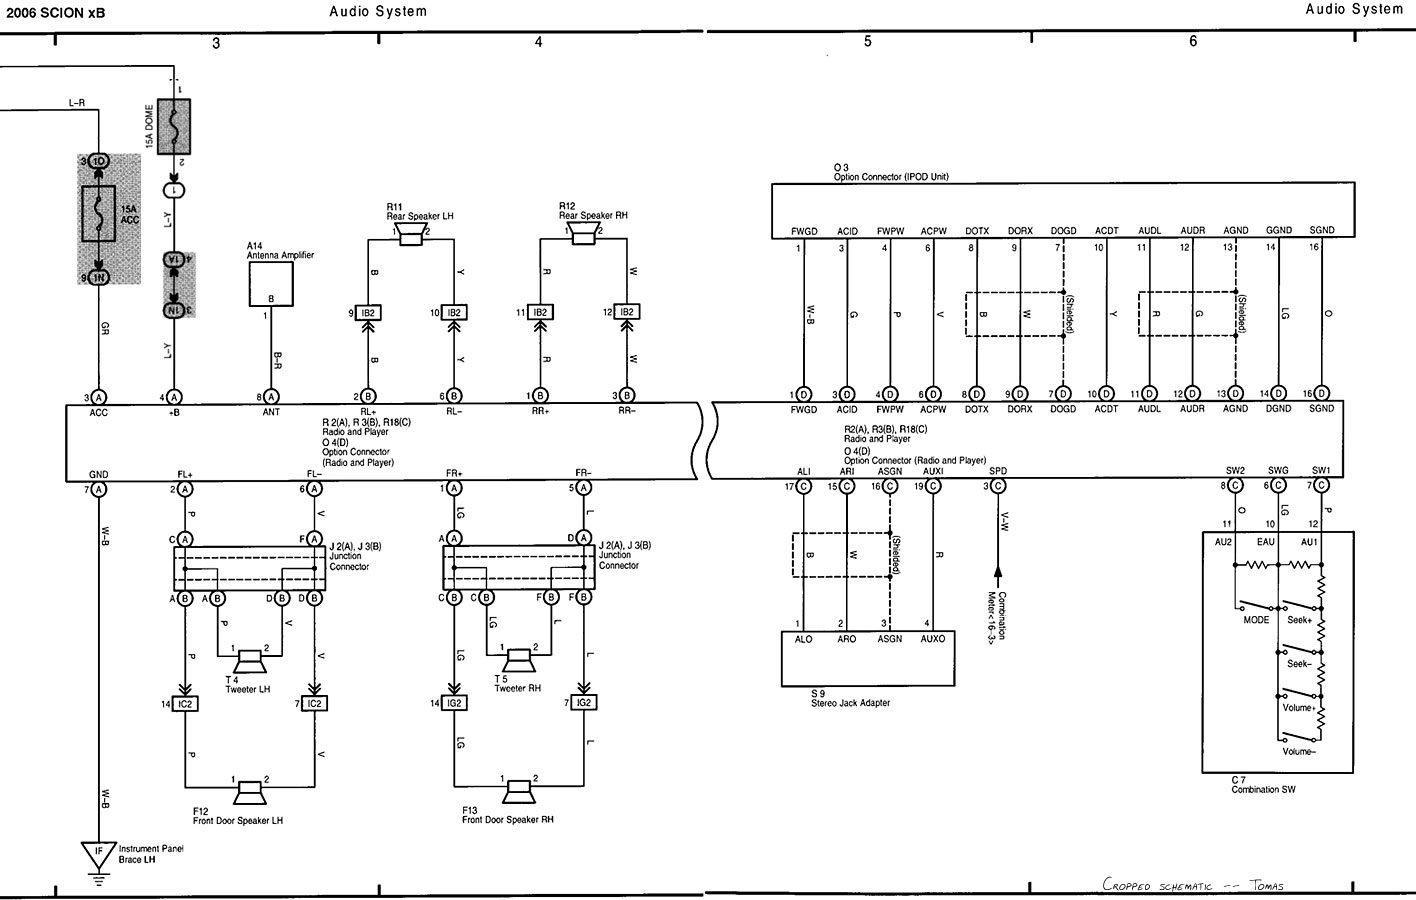 05 scion xb horn wiring diagram wiring diagram rh 13 samovila de